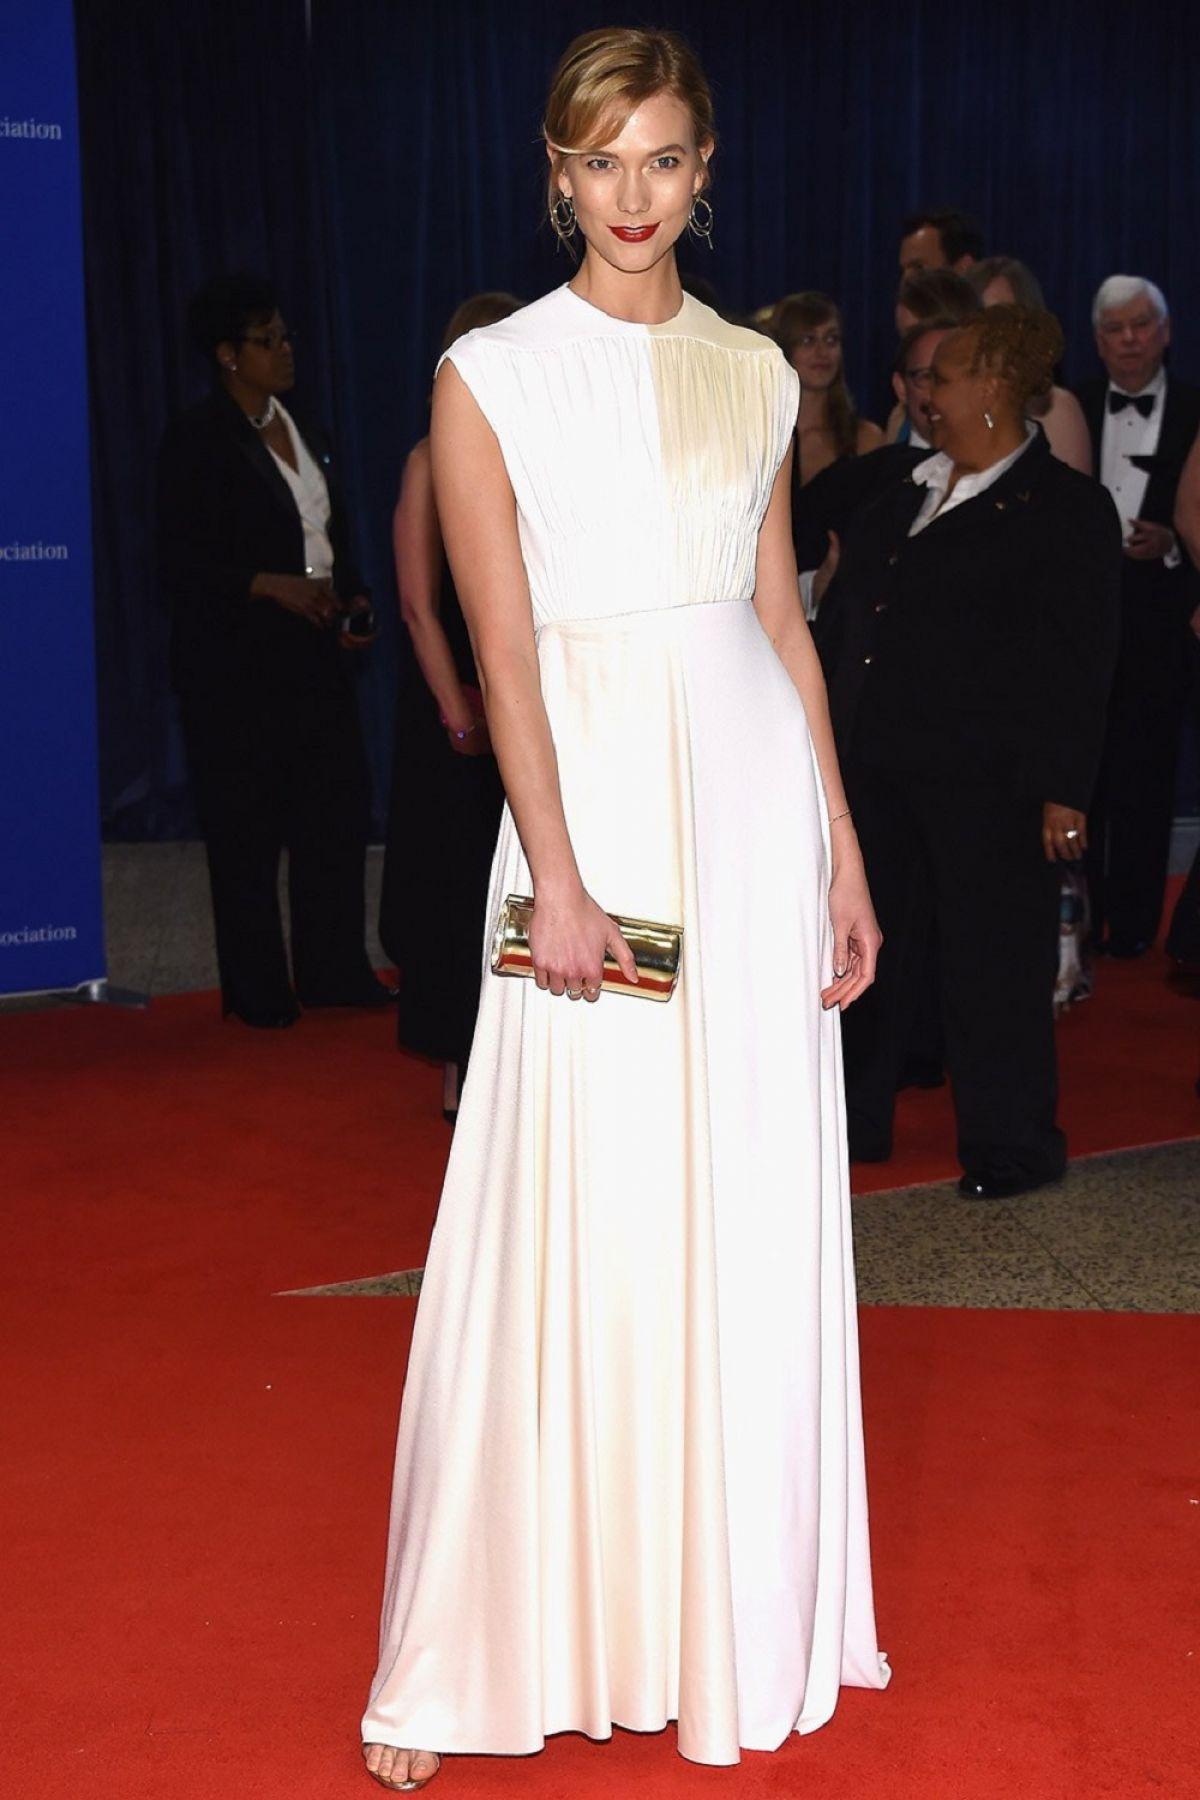 KARLIE KLOSS at White House Correspondents' Dinner in Washington 04/30/2016